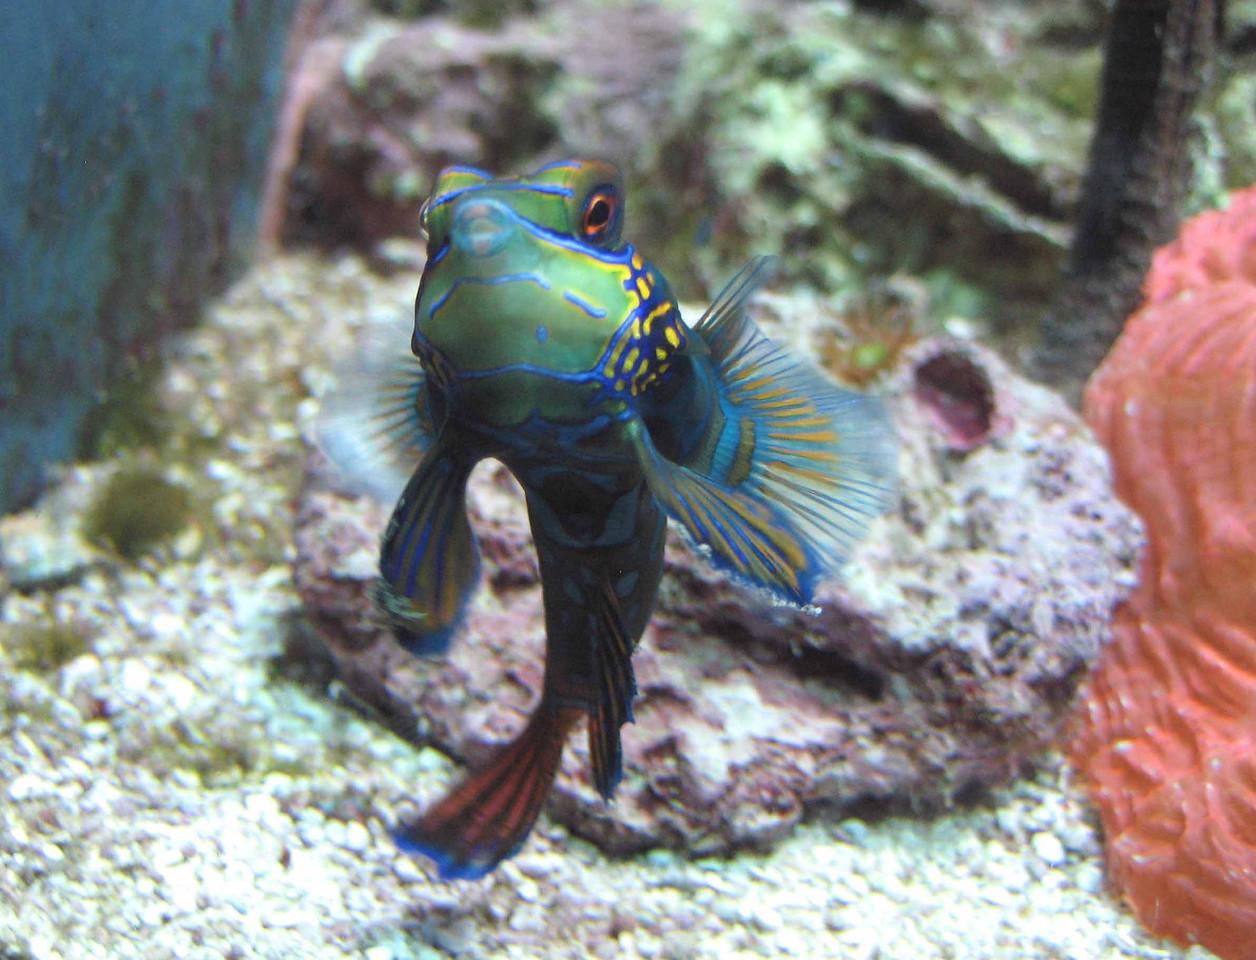 the purse of Nereid lips seemed to speak of sea treasures beyond this preserve...